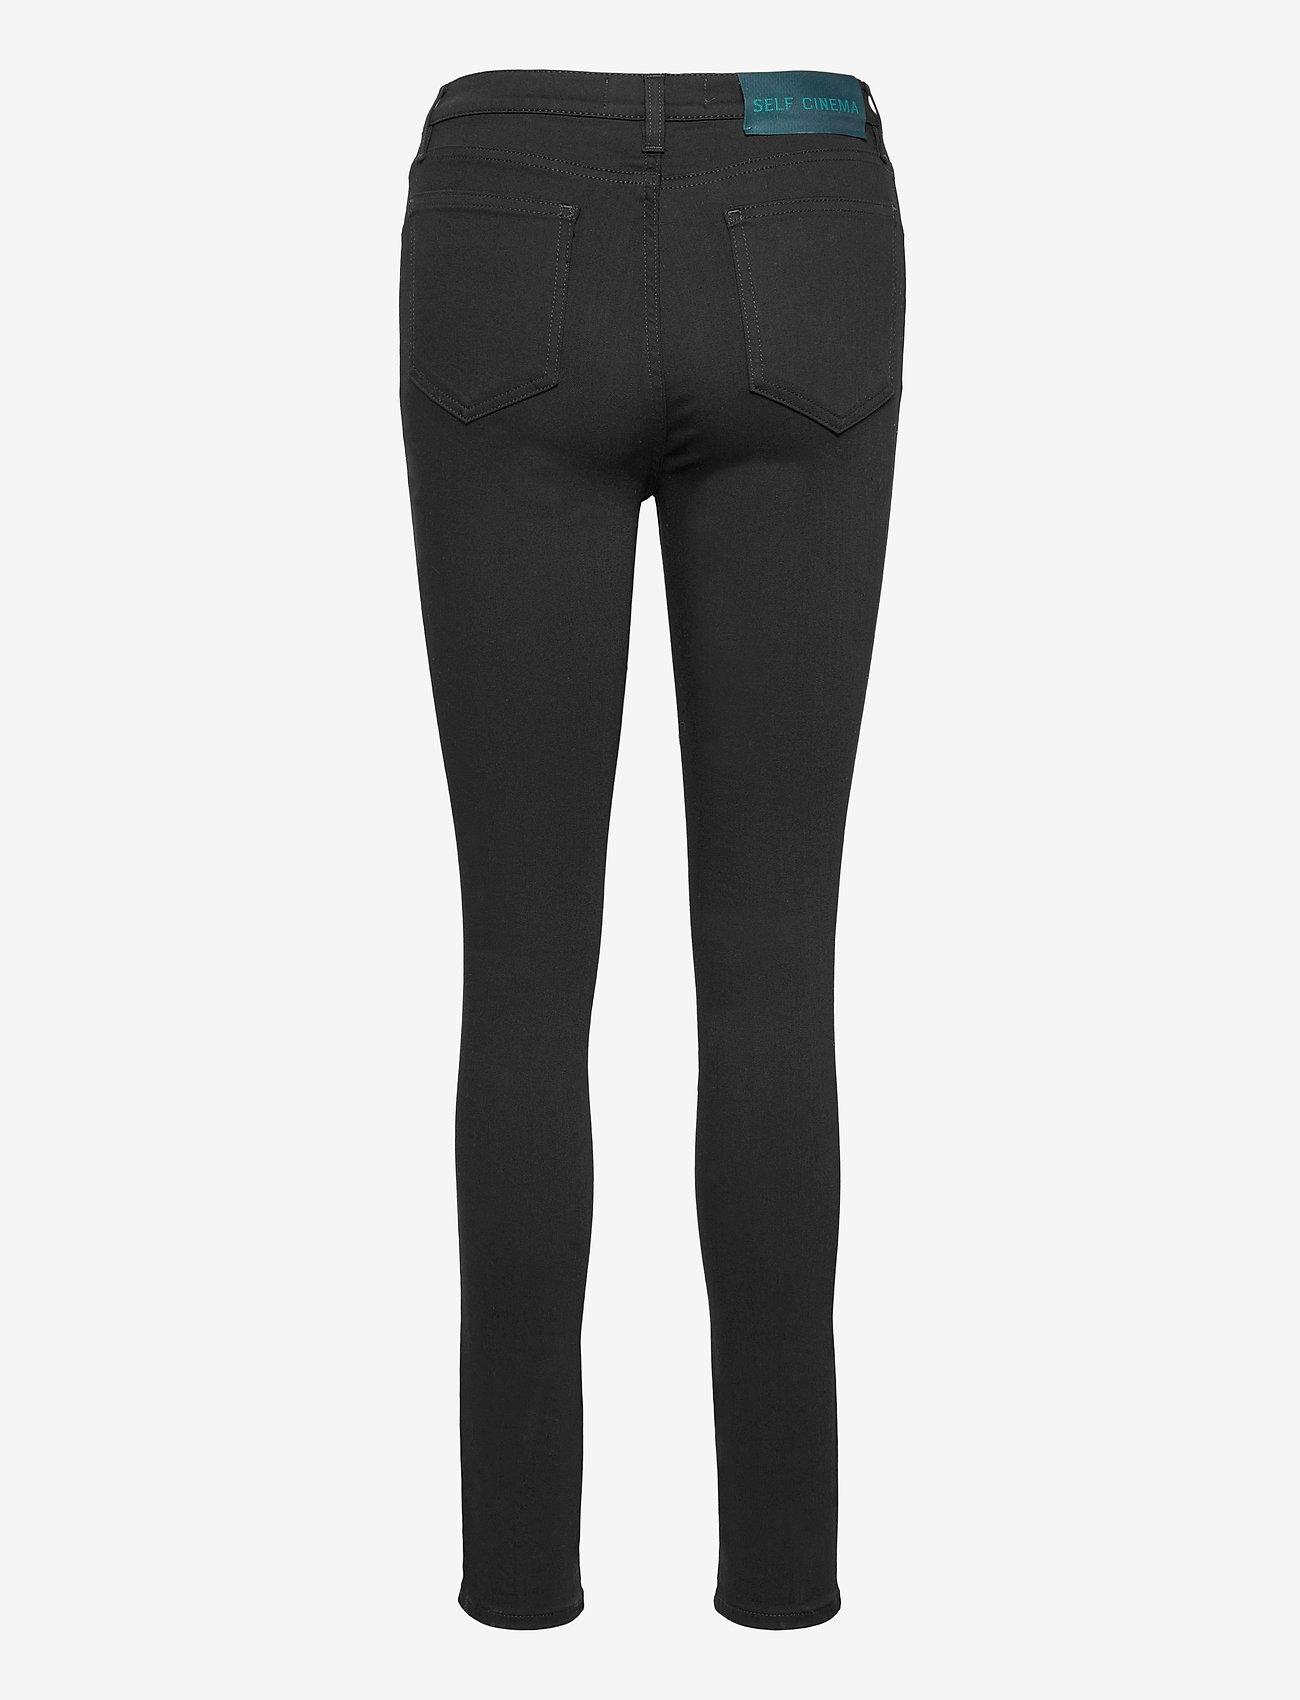 Self Cinema - Womens Skinny Jean - skinny jeans - stay black - 1